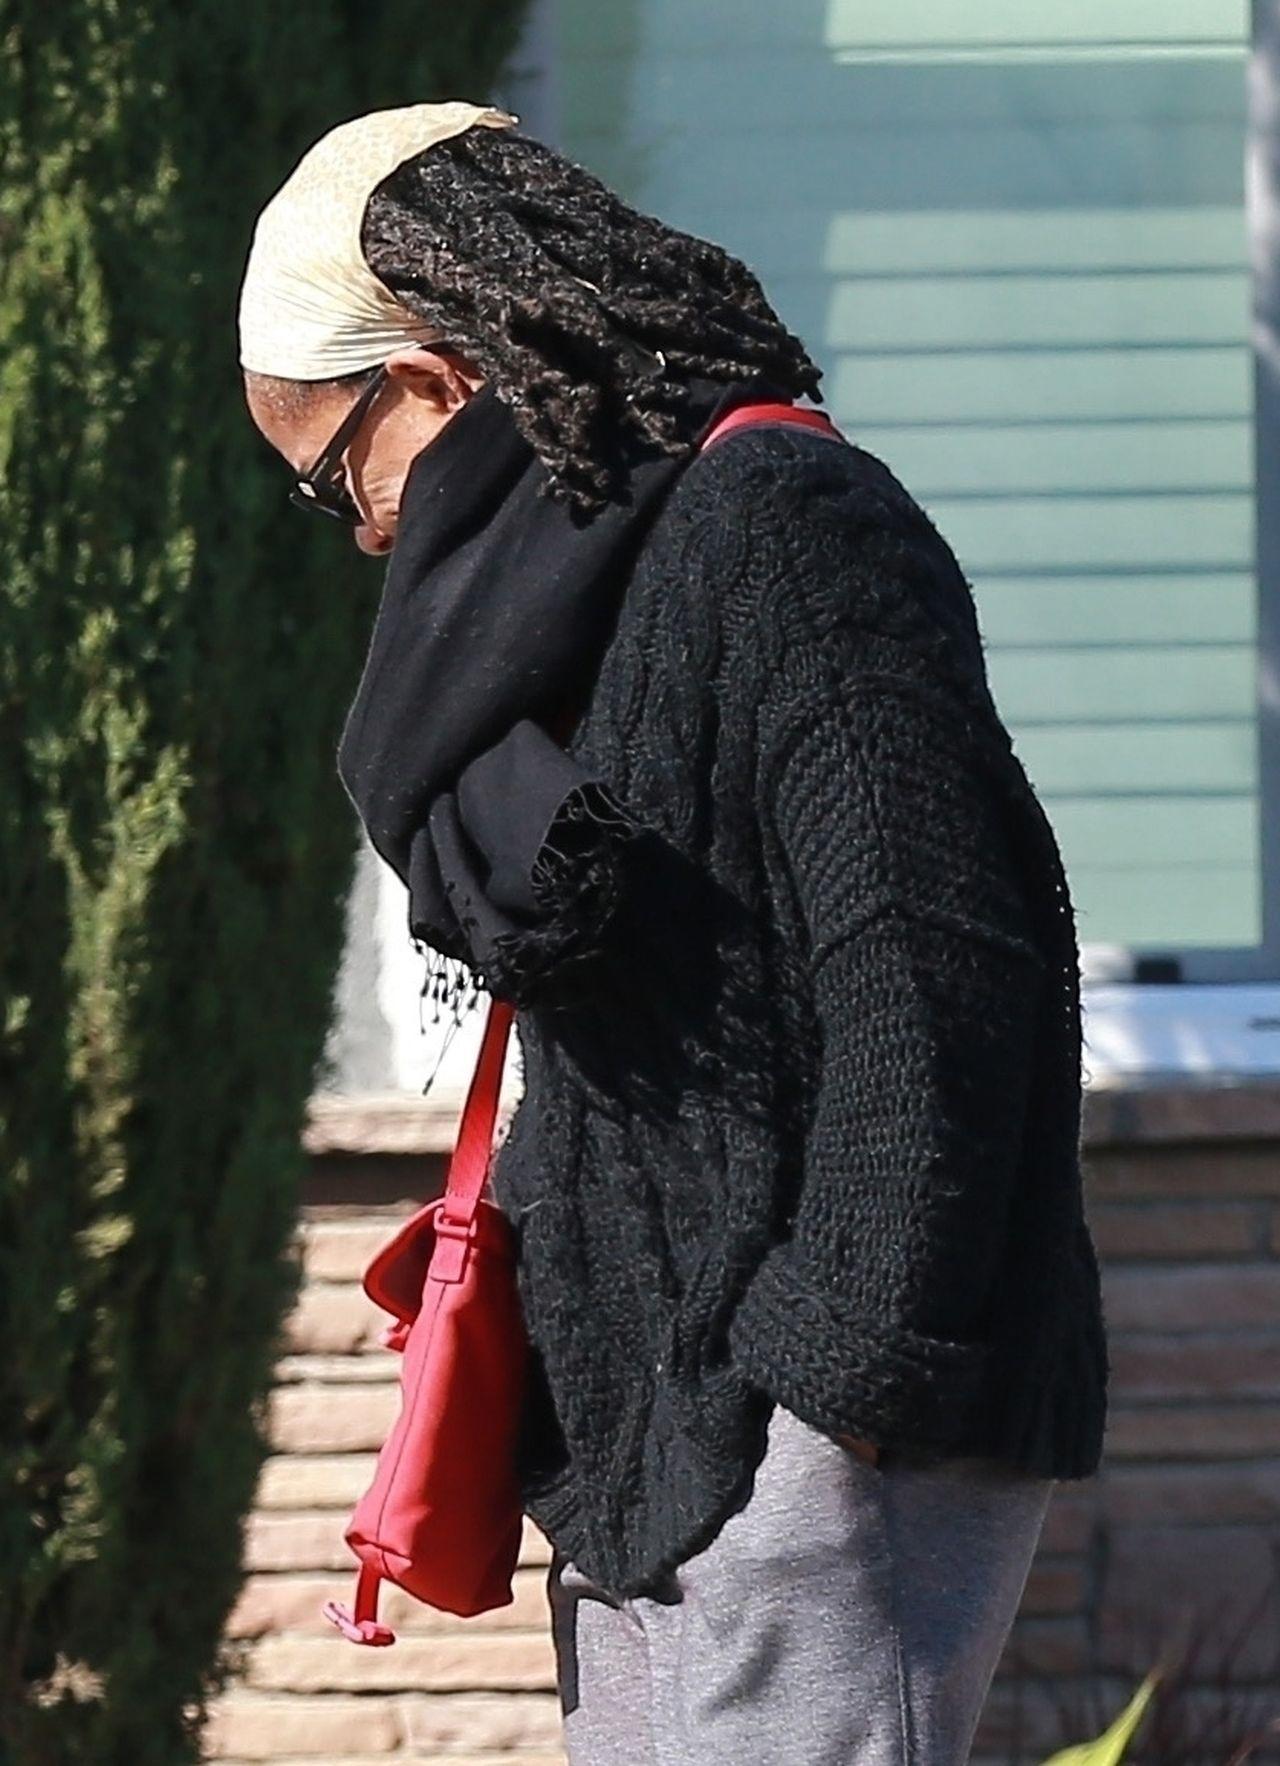 Doria Ragland, matka Meghan Markle, na spacerze z psami podczas epidemii koronawirusa